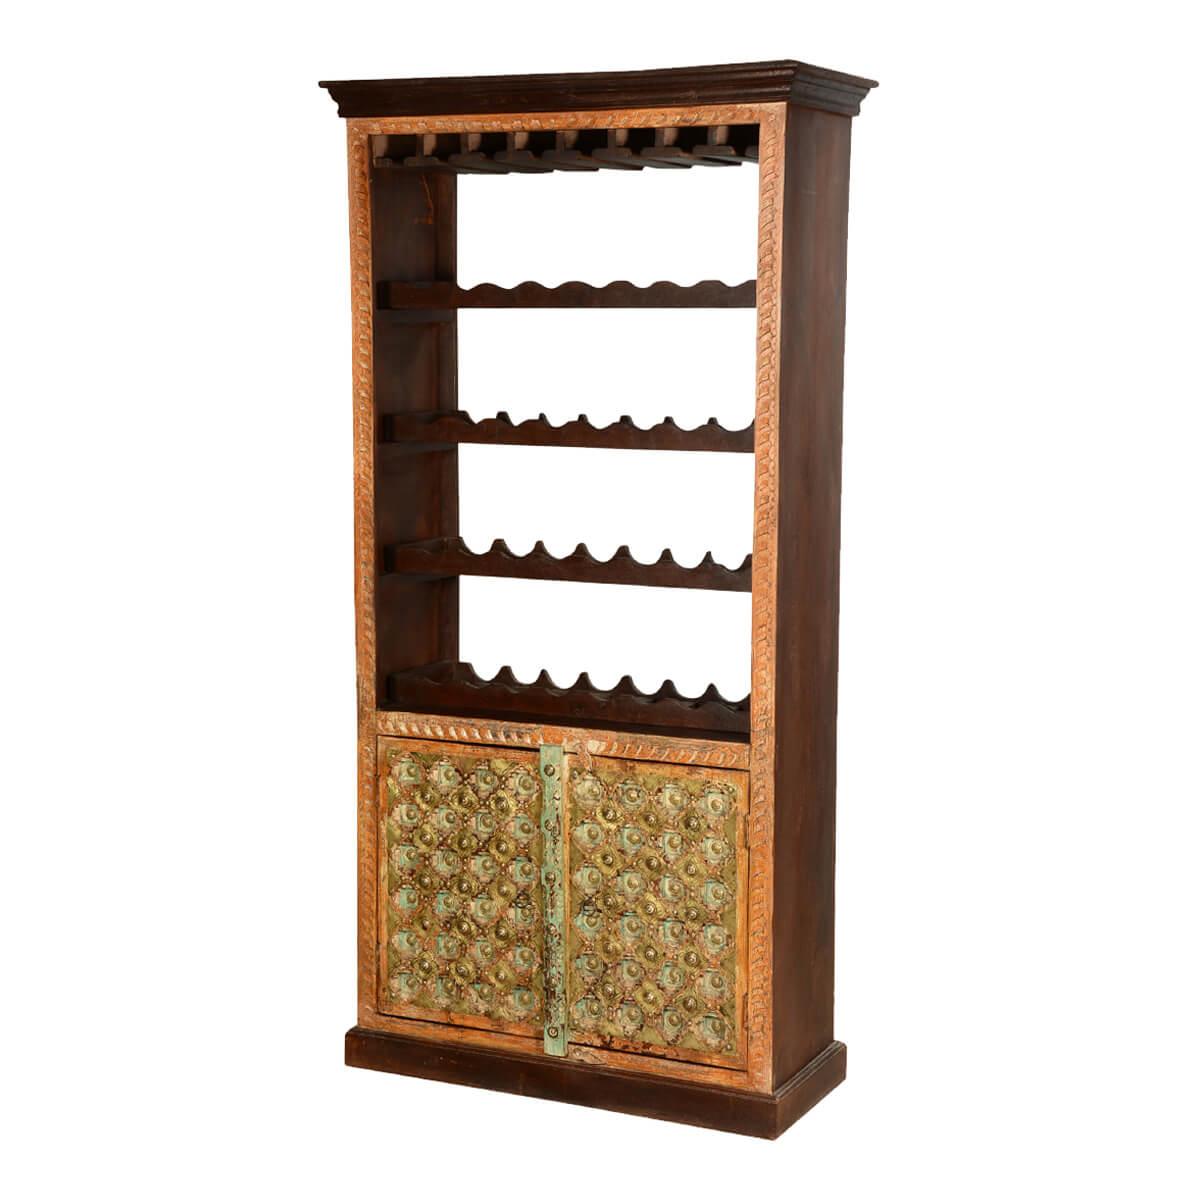 Lodi Golden Diamonds Brass Inlay Mango Wood Tall Wine Rack